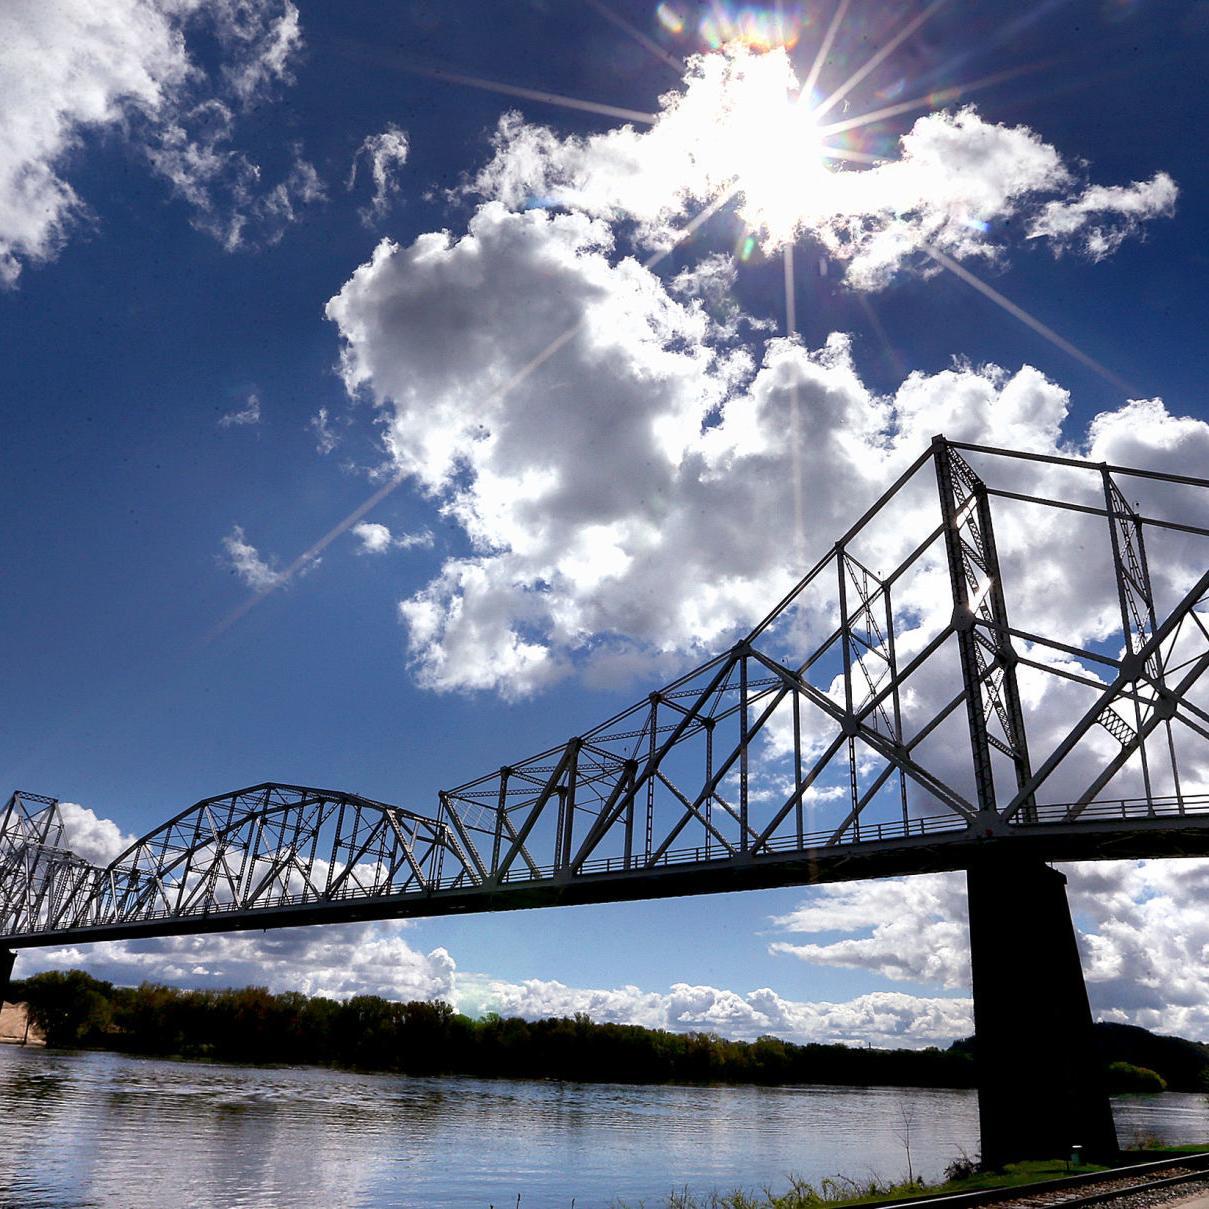 Sooner or later, say goodbye to the Lansing bridge as you